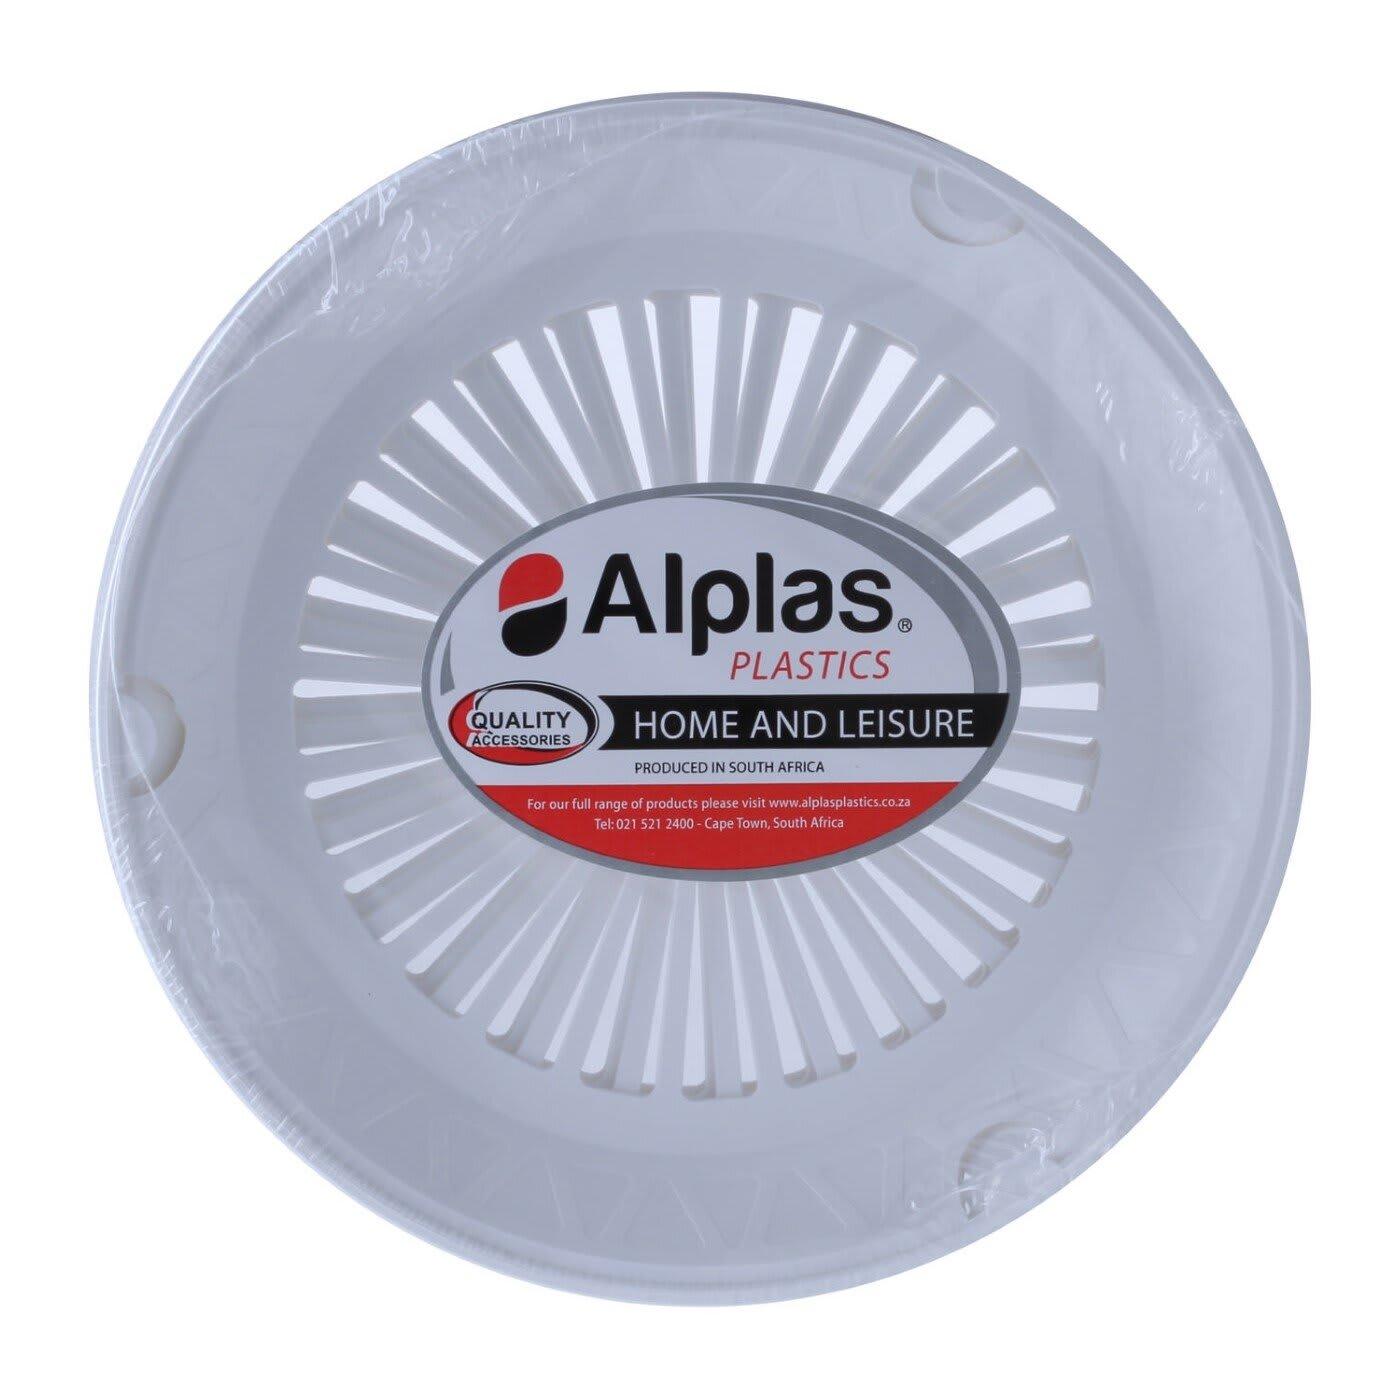 Alplas Paperplate holder 4 pack